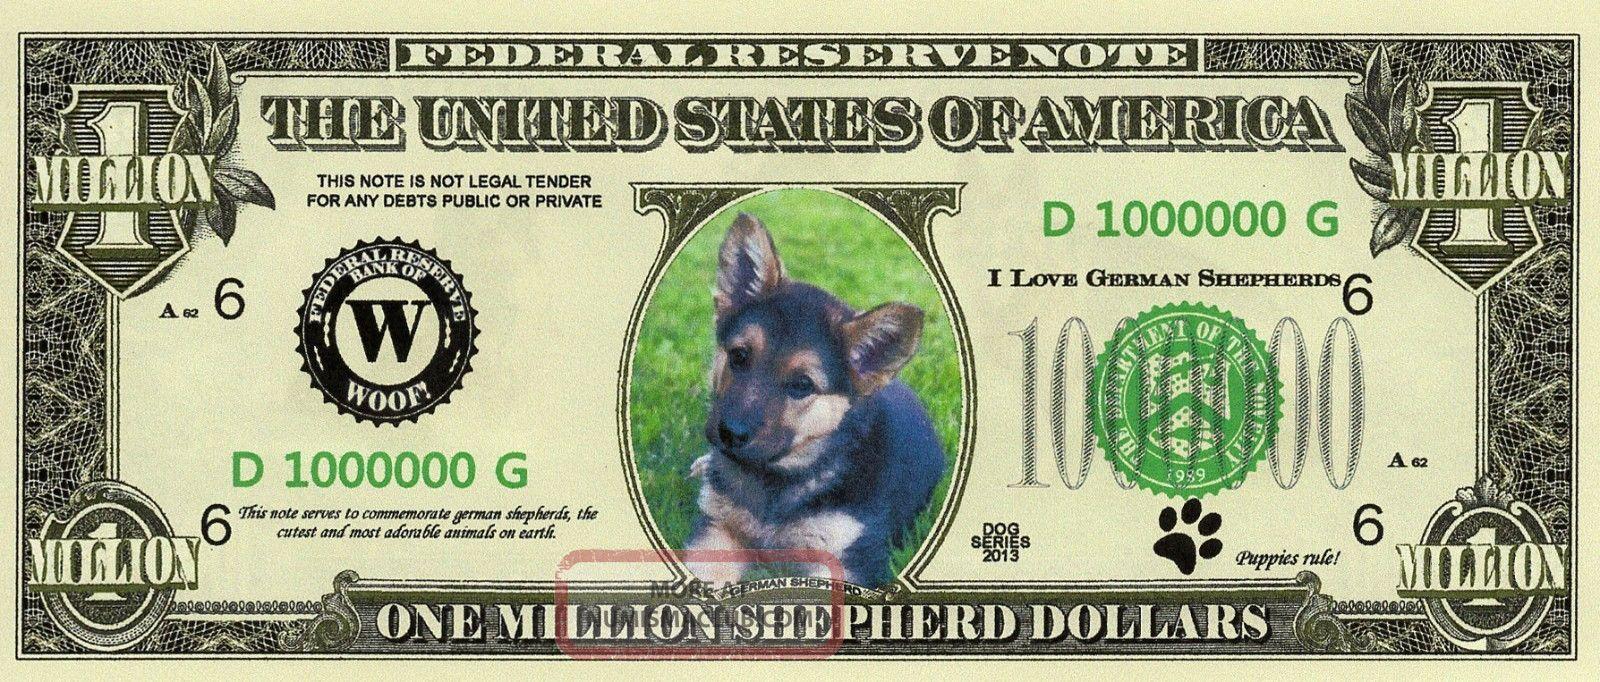 German Shepherd Puppy Dog Novelty 1 Million Dollar Bills Pet Animal Lover Money Paper